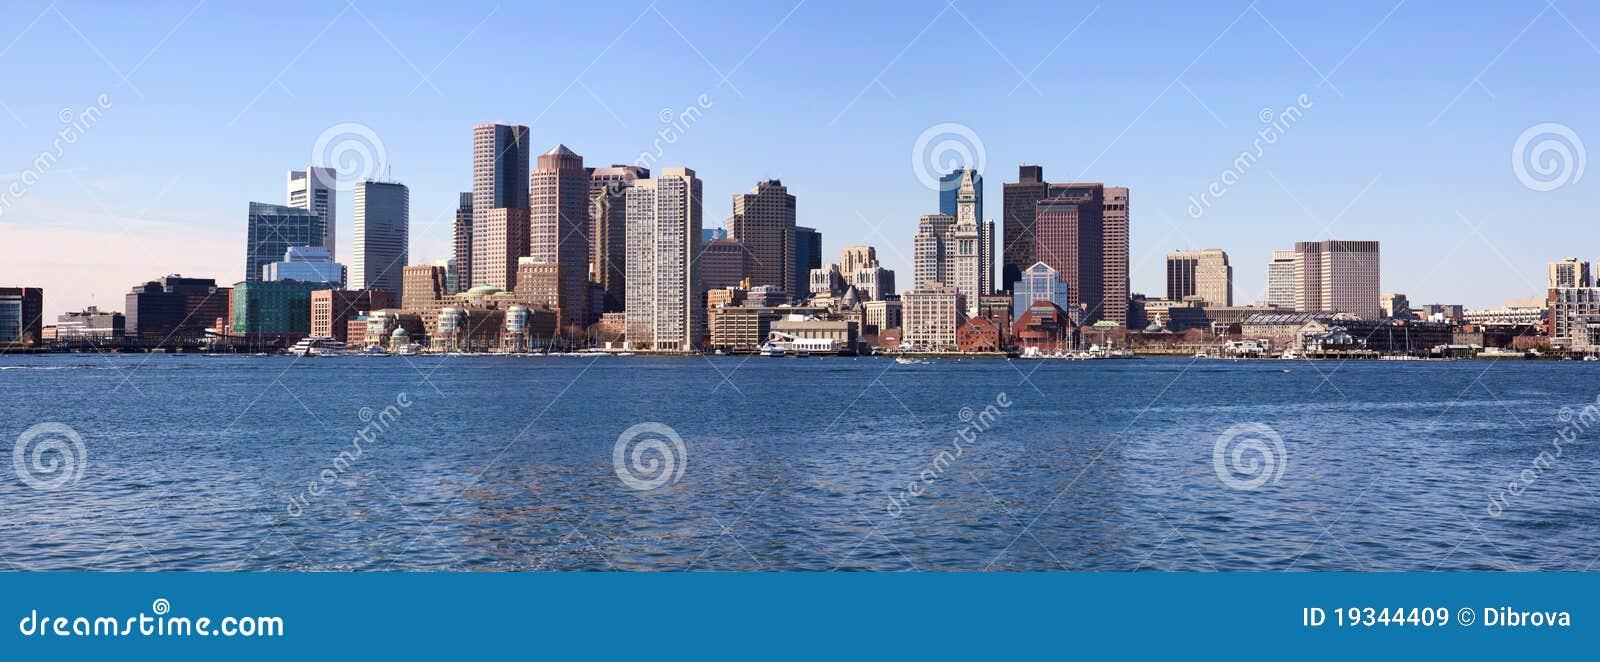 Panorama del horizonte de Boston